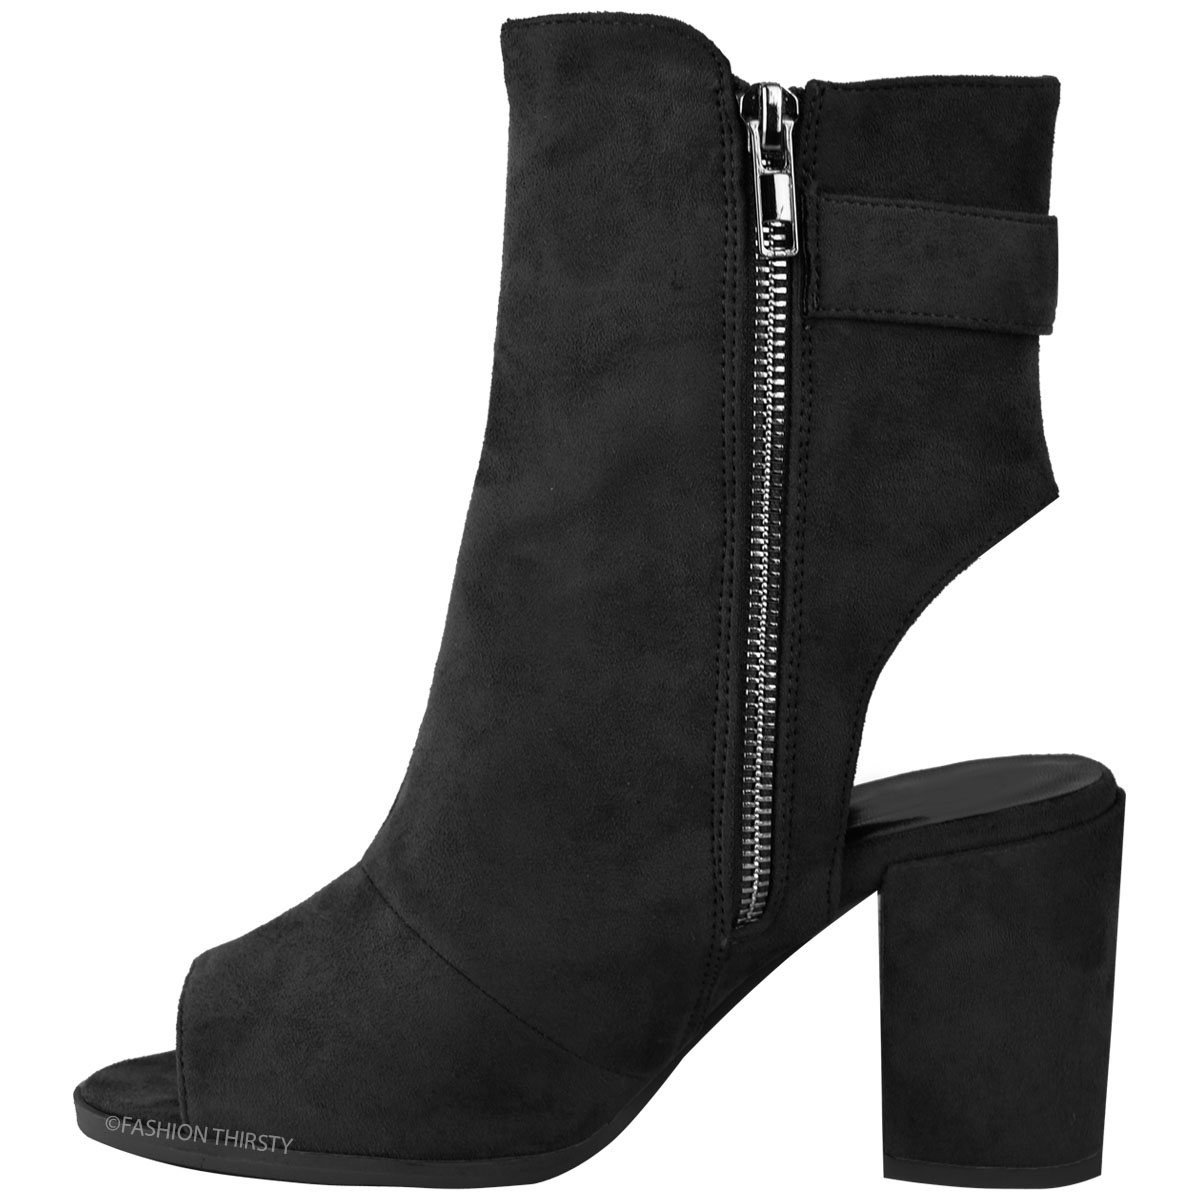 06e69c52f204 Womens Ladies Ankle Boots Mid Block Heel Peep Toe Open Back Buckle ...